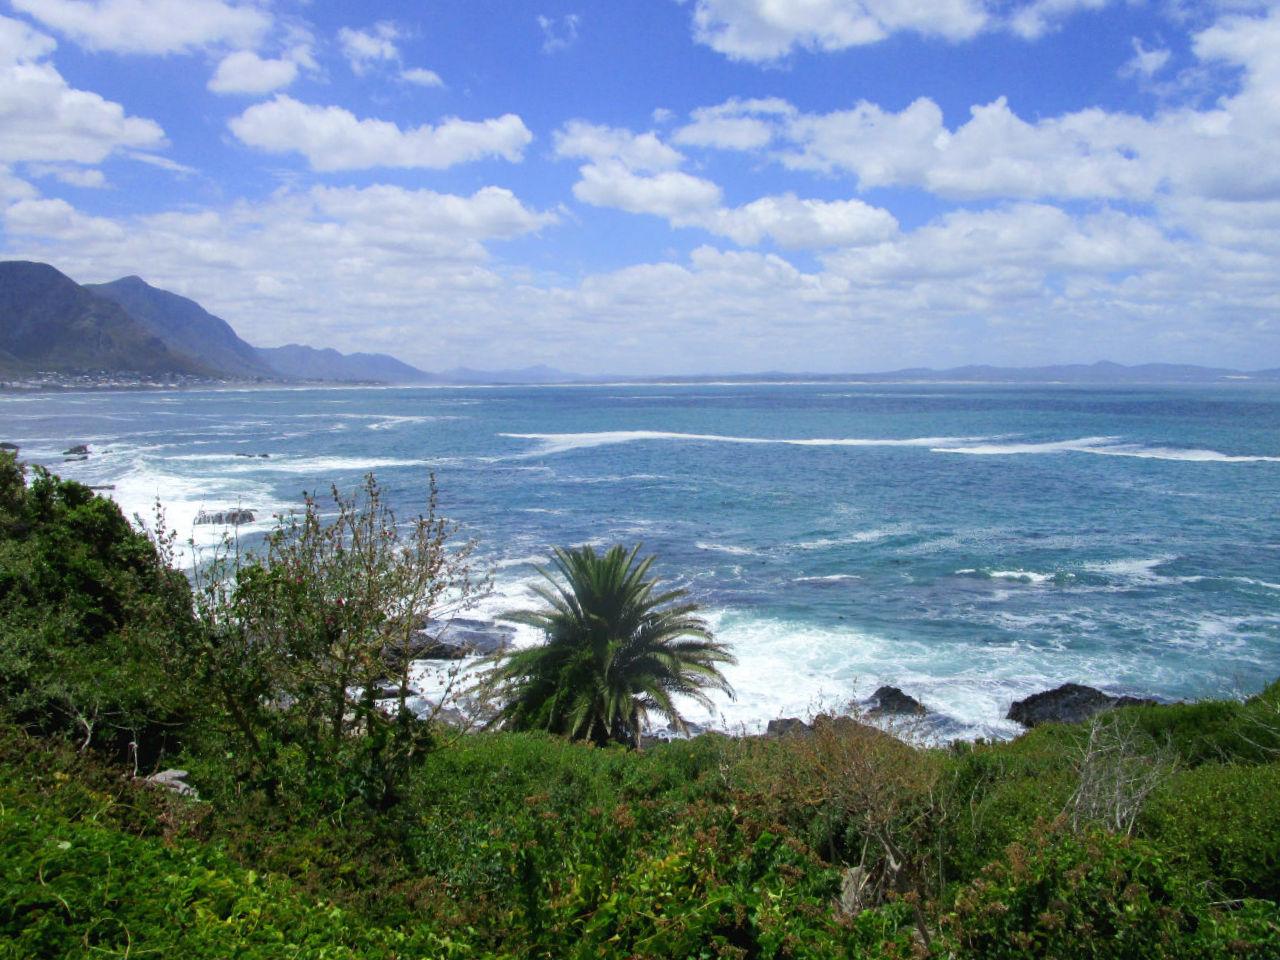 Nachhaltig_reisen_Suedafrika_Hermanus